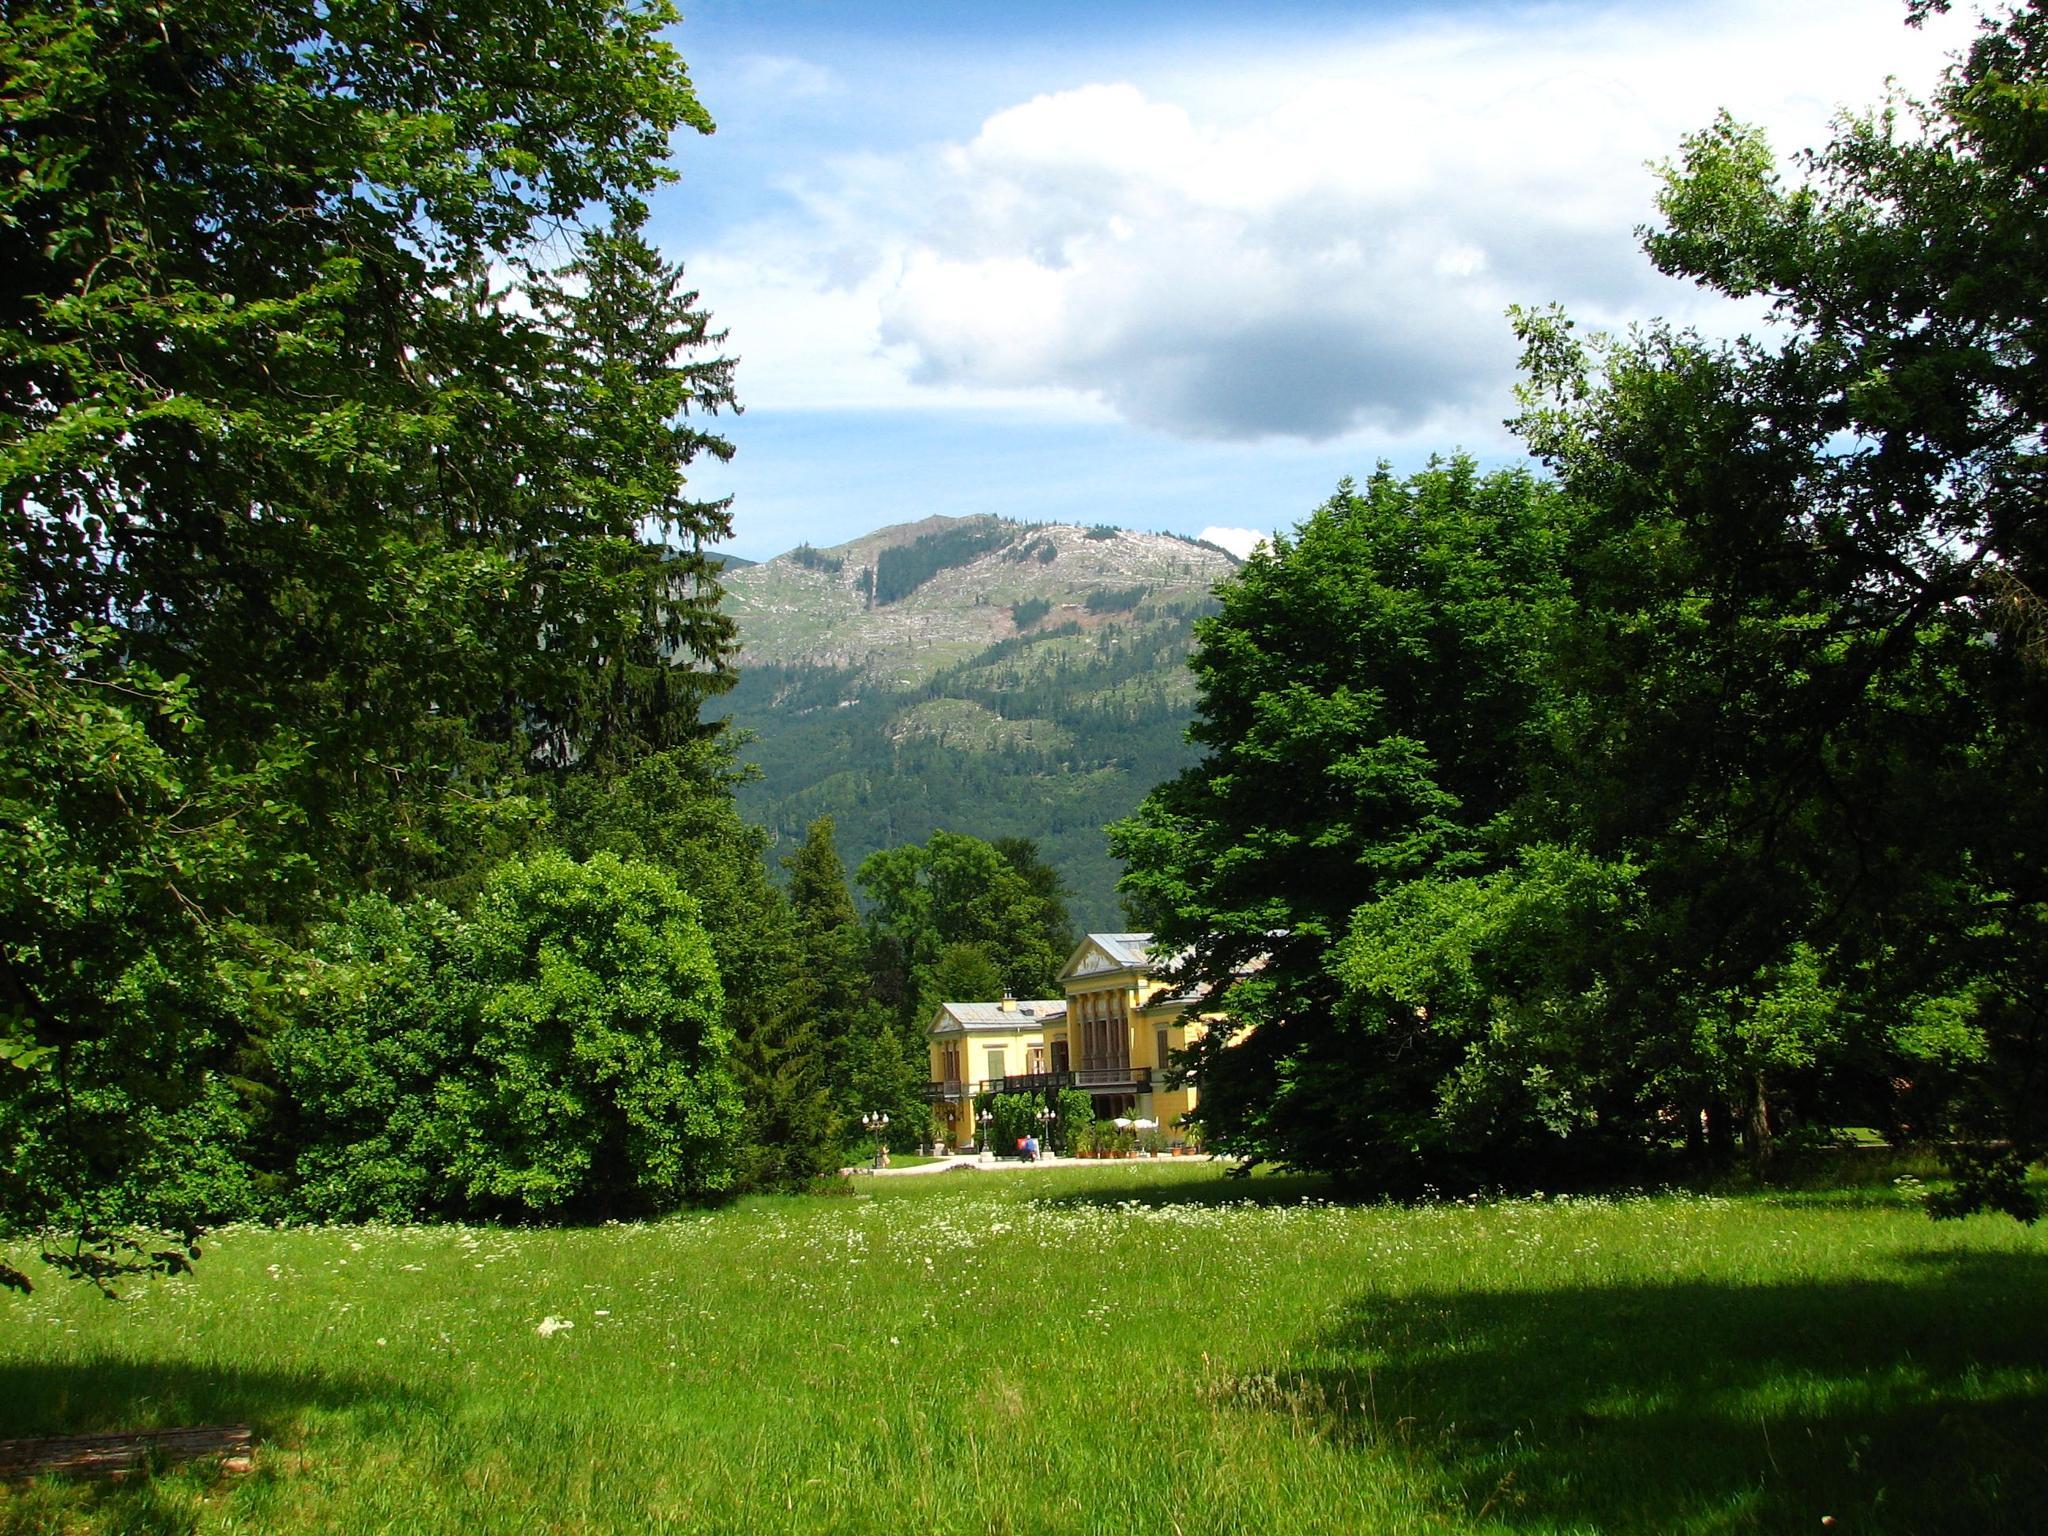 Bad Ischl Landscape by hunyadigeza